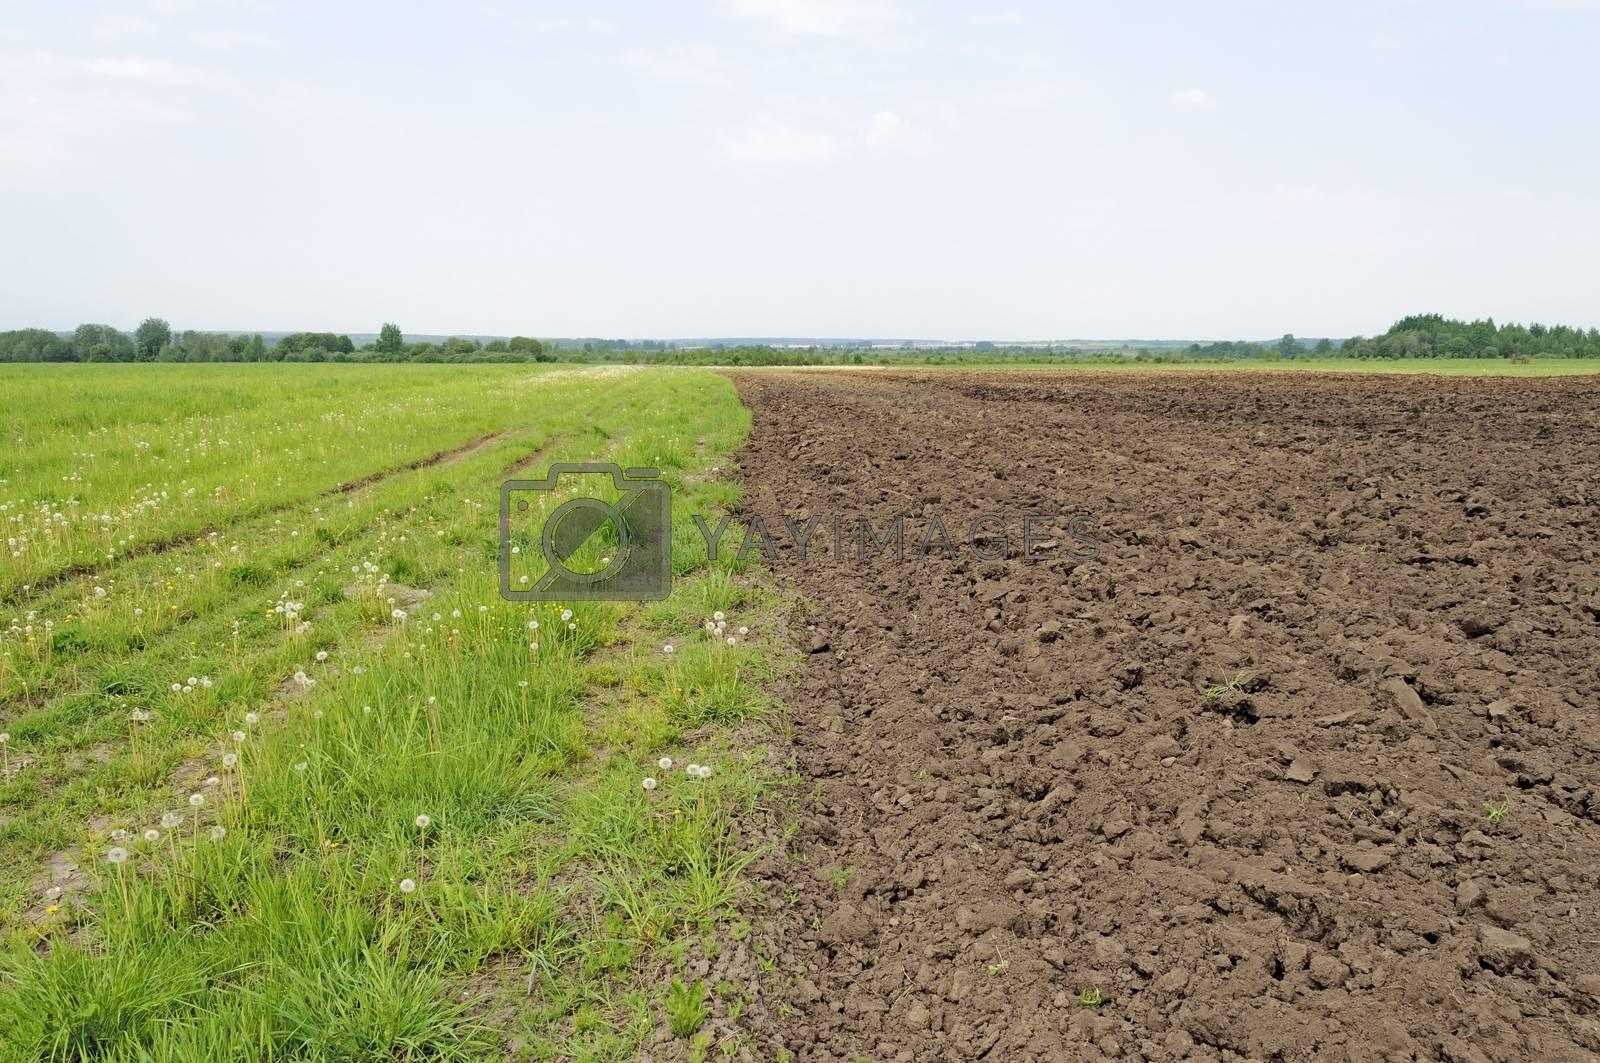 Freshly plowed farm field before sowing, spring time